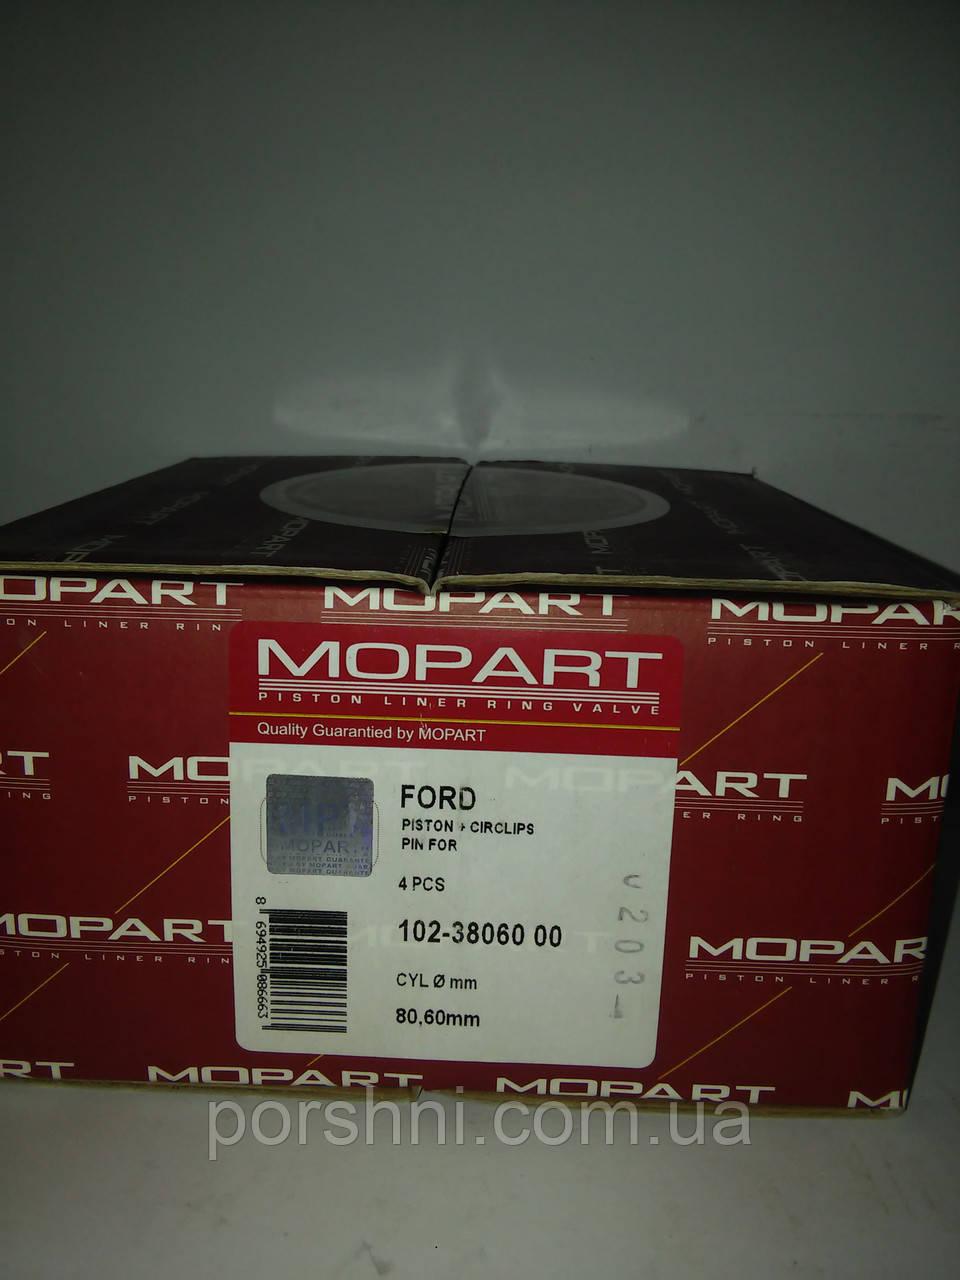 Поршни Ford  Сonnect  1.8  ZETEC  80.6 STD   ( 1.2 x 1.5 x 2.5 )   Mopart 3806000 б/кол